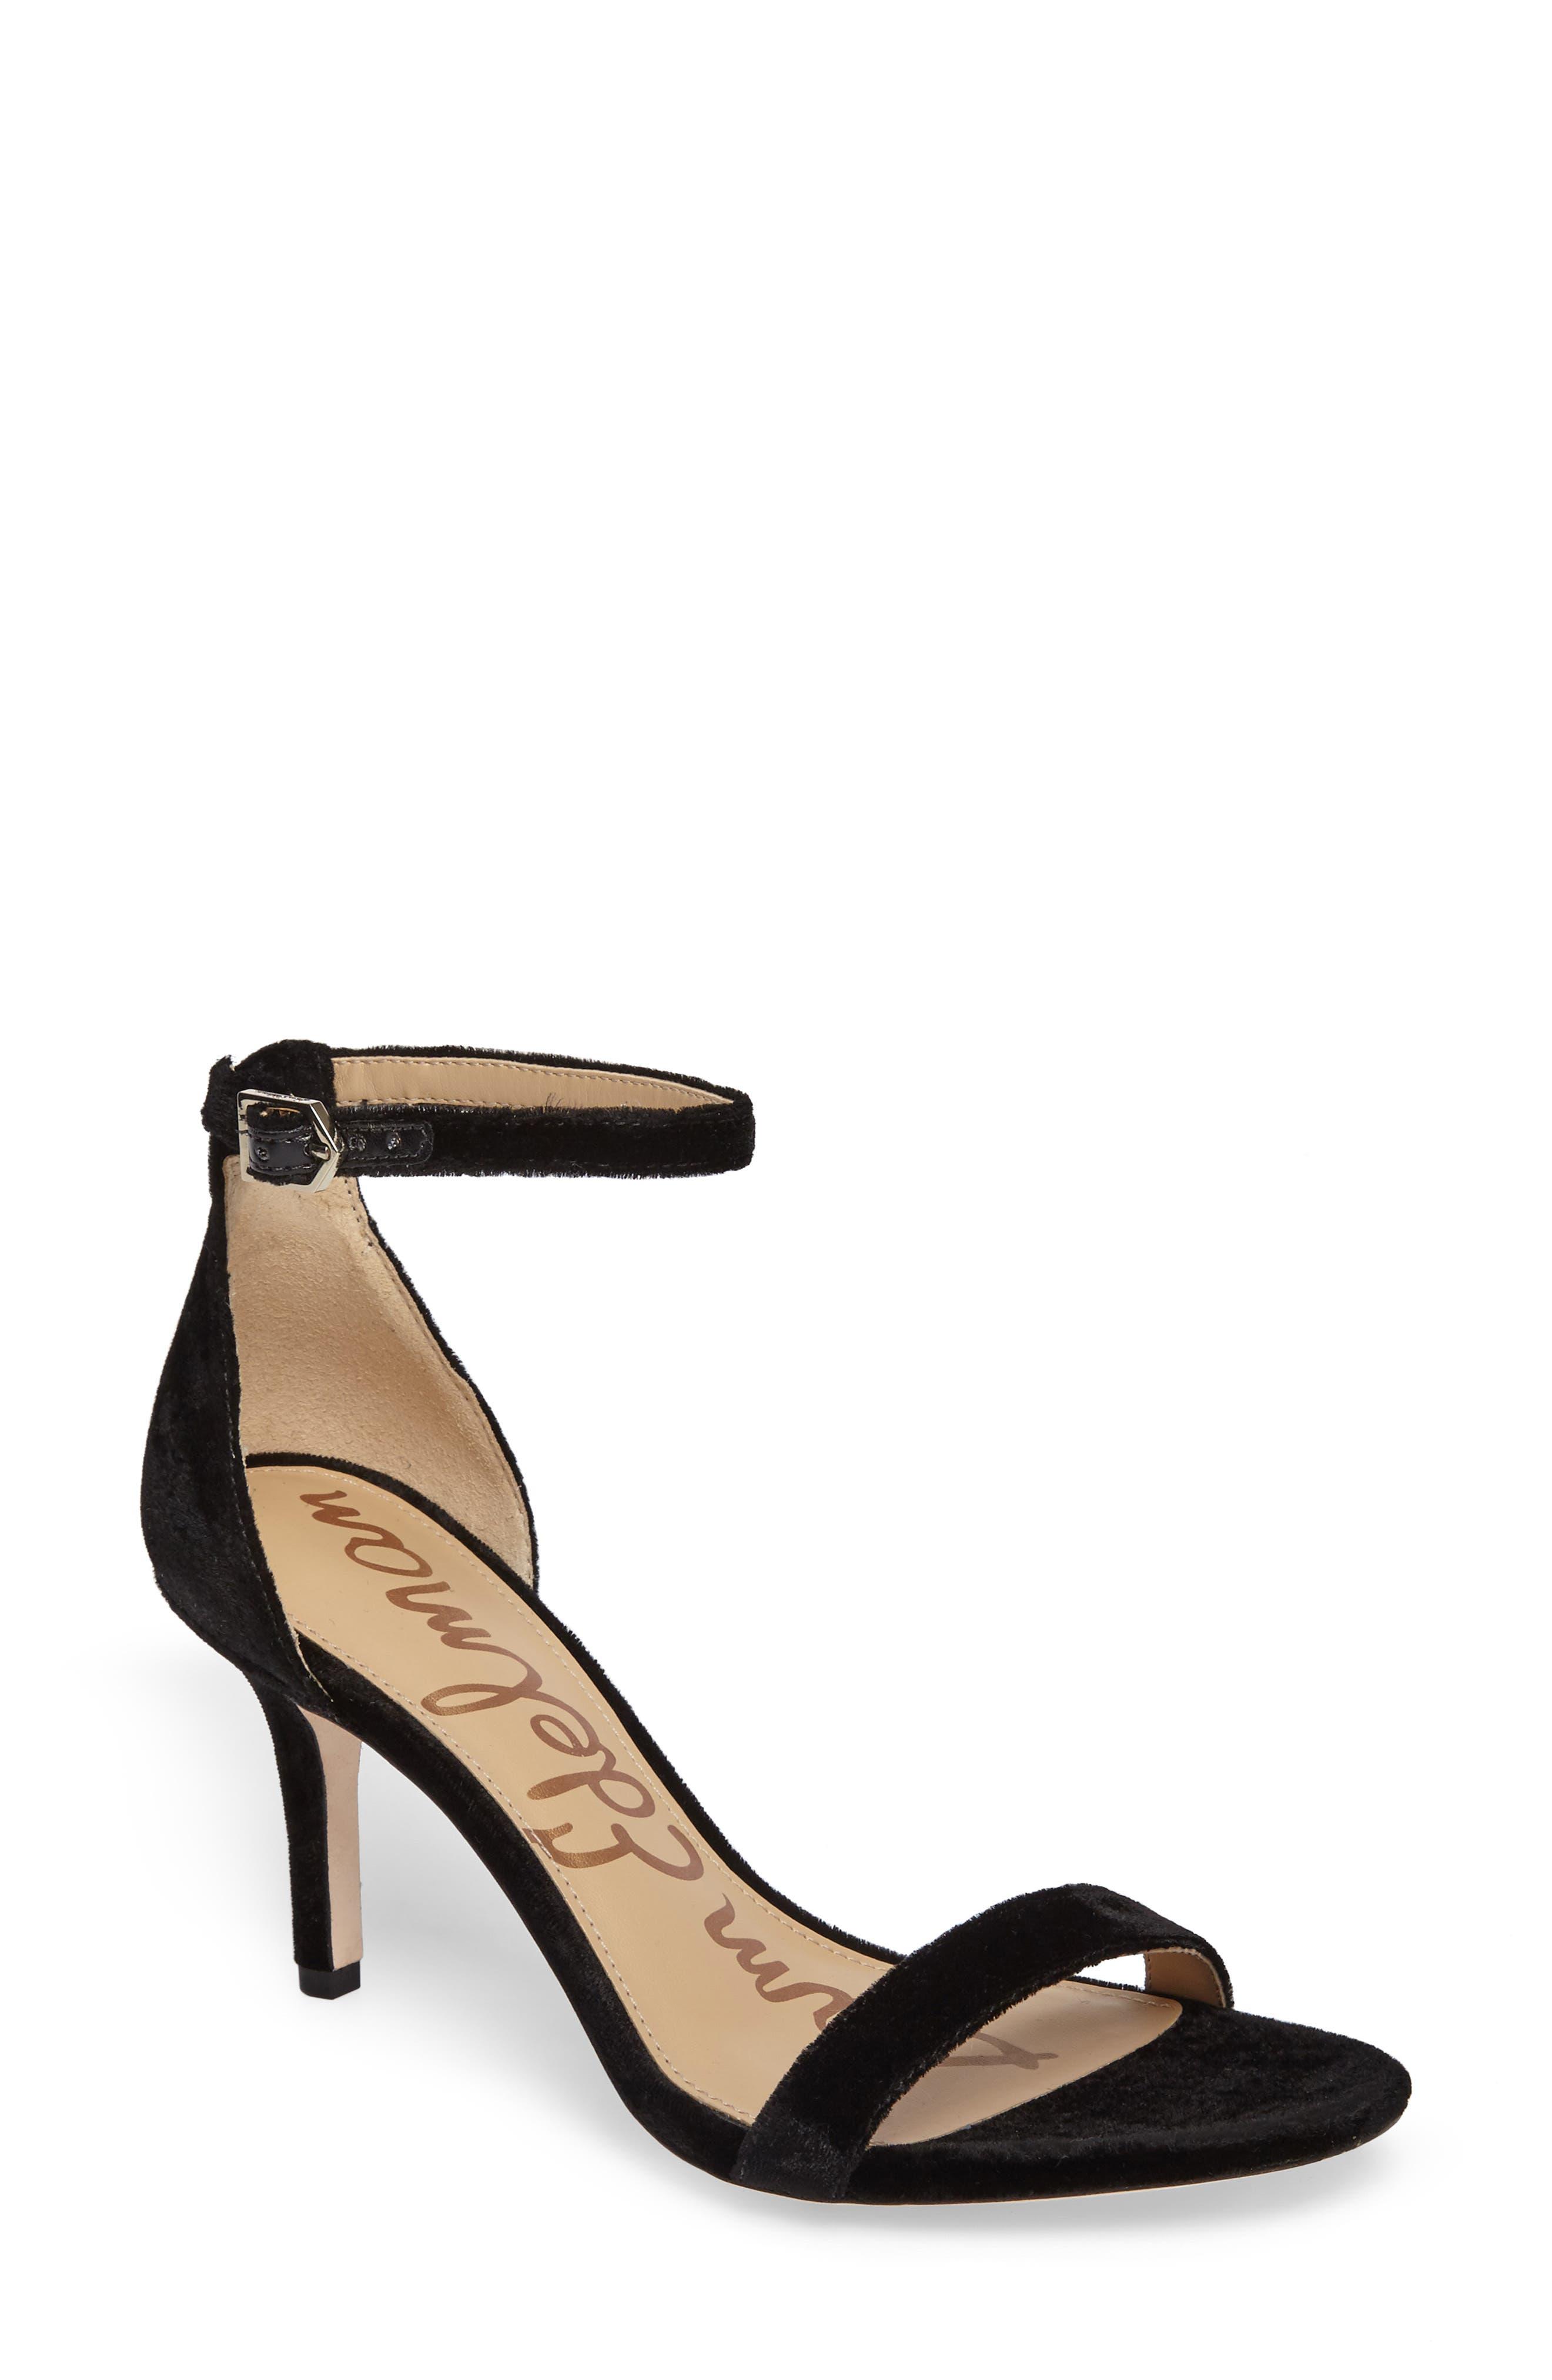 SAM EDELMAN 'Patti' Ankle Strap Sandal, Main, color, BLACK VELVET